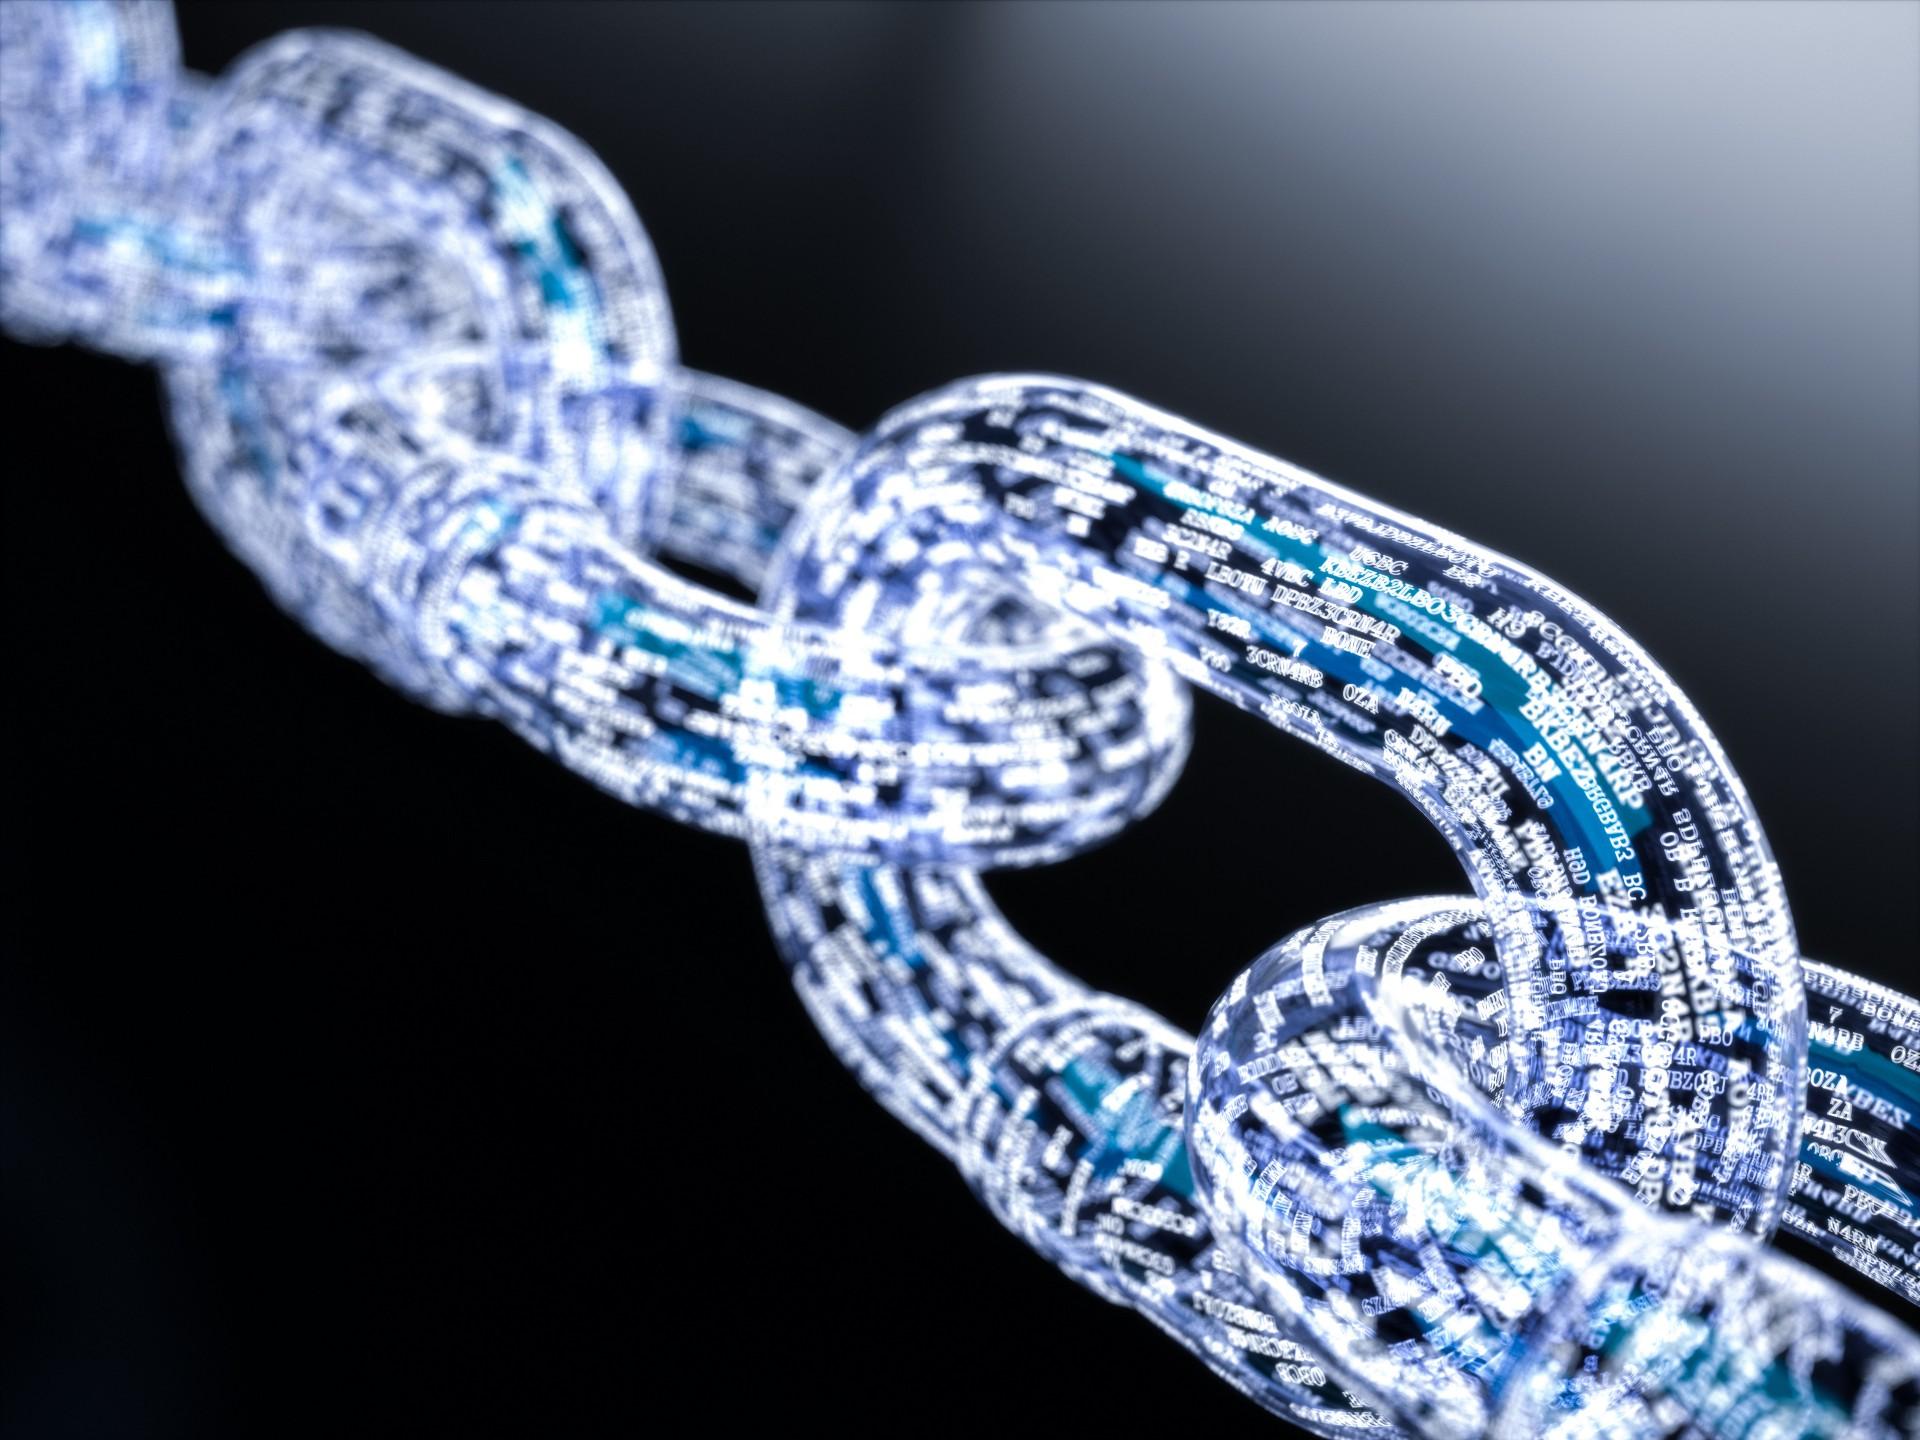 Programar en blockchain: ¿por dónde comenzar?